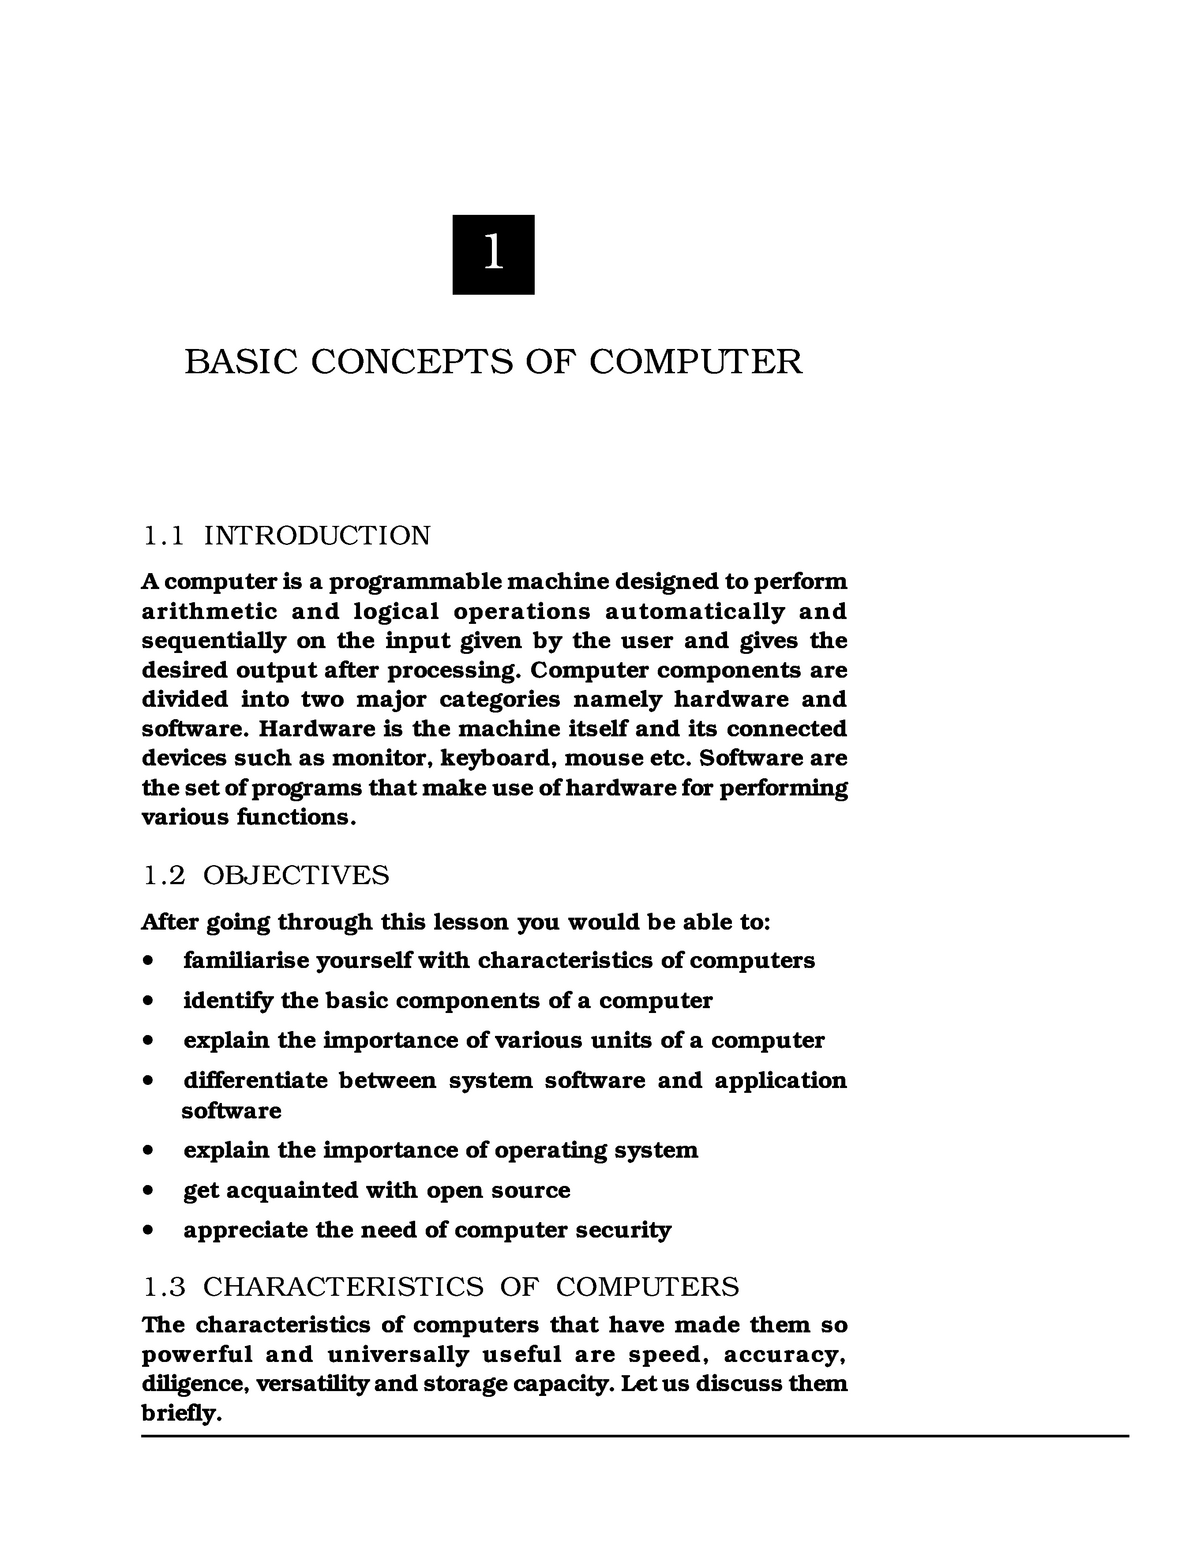 Computer applications - Public administration pa 2204 - StuDocu